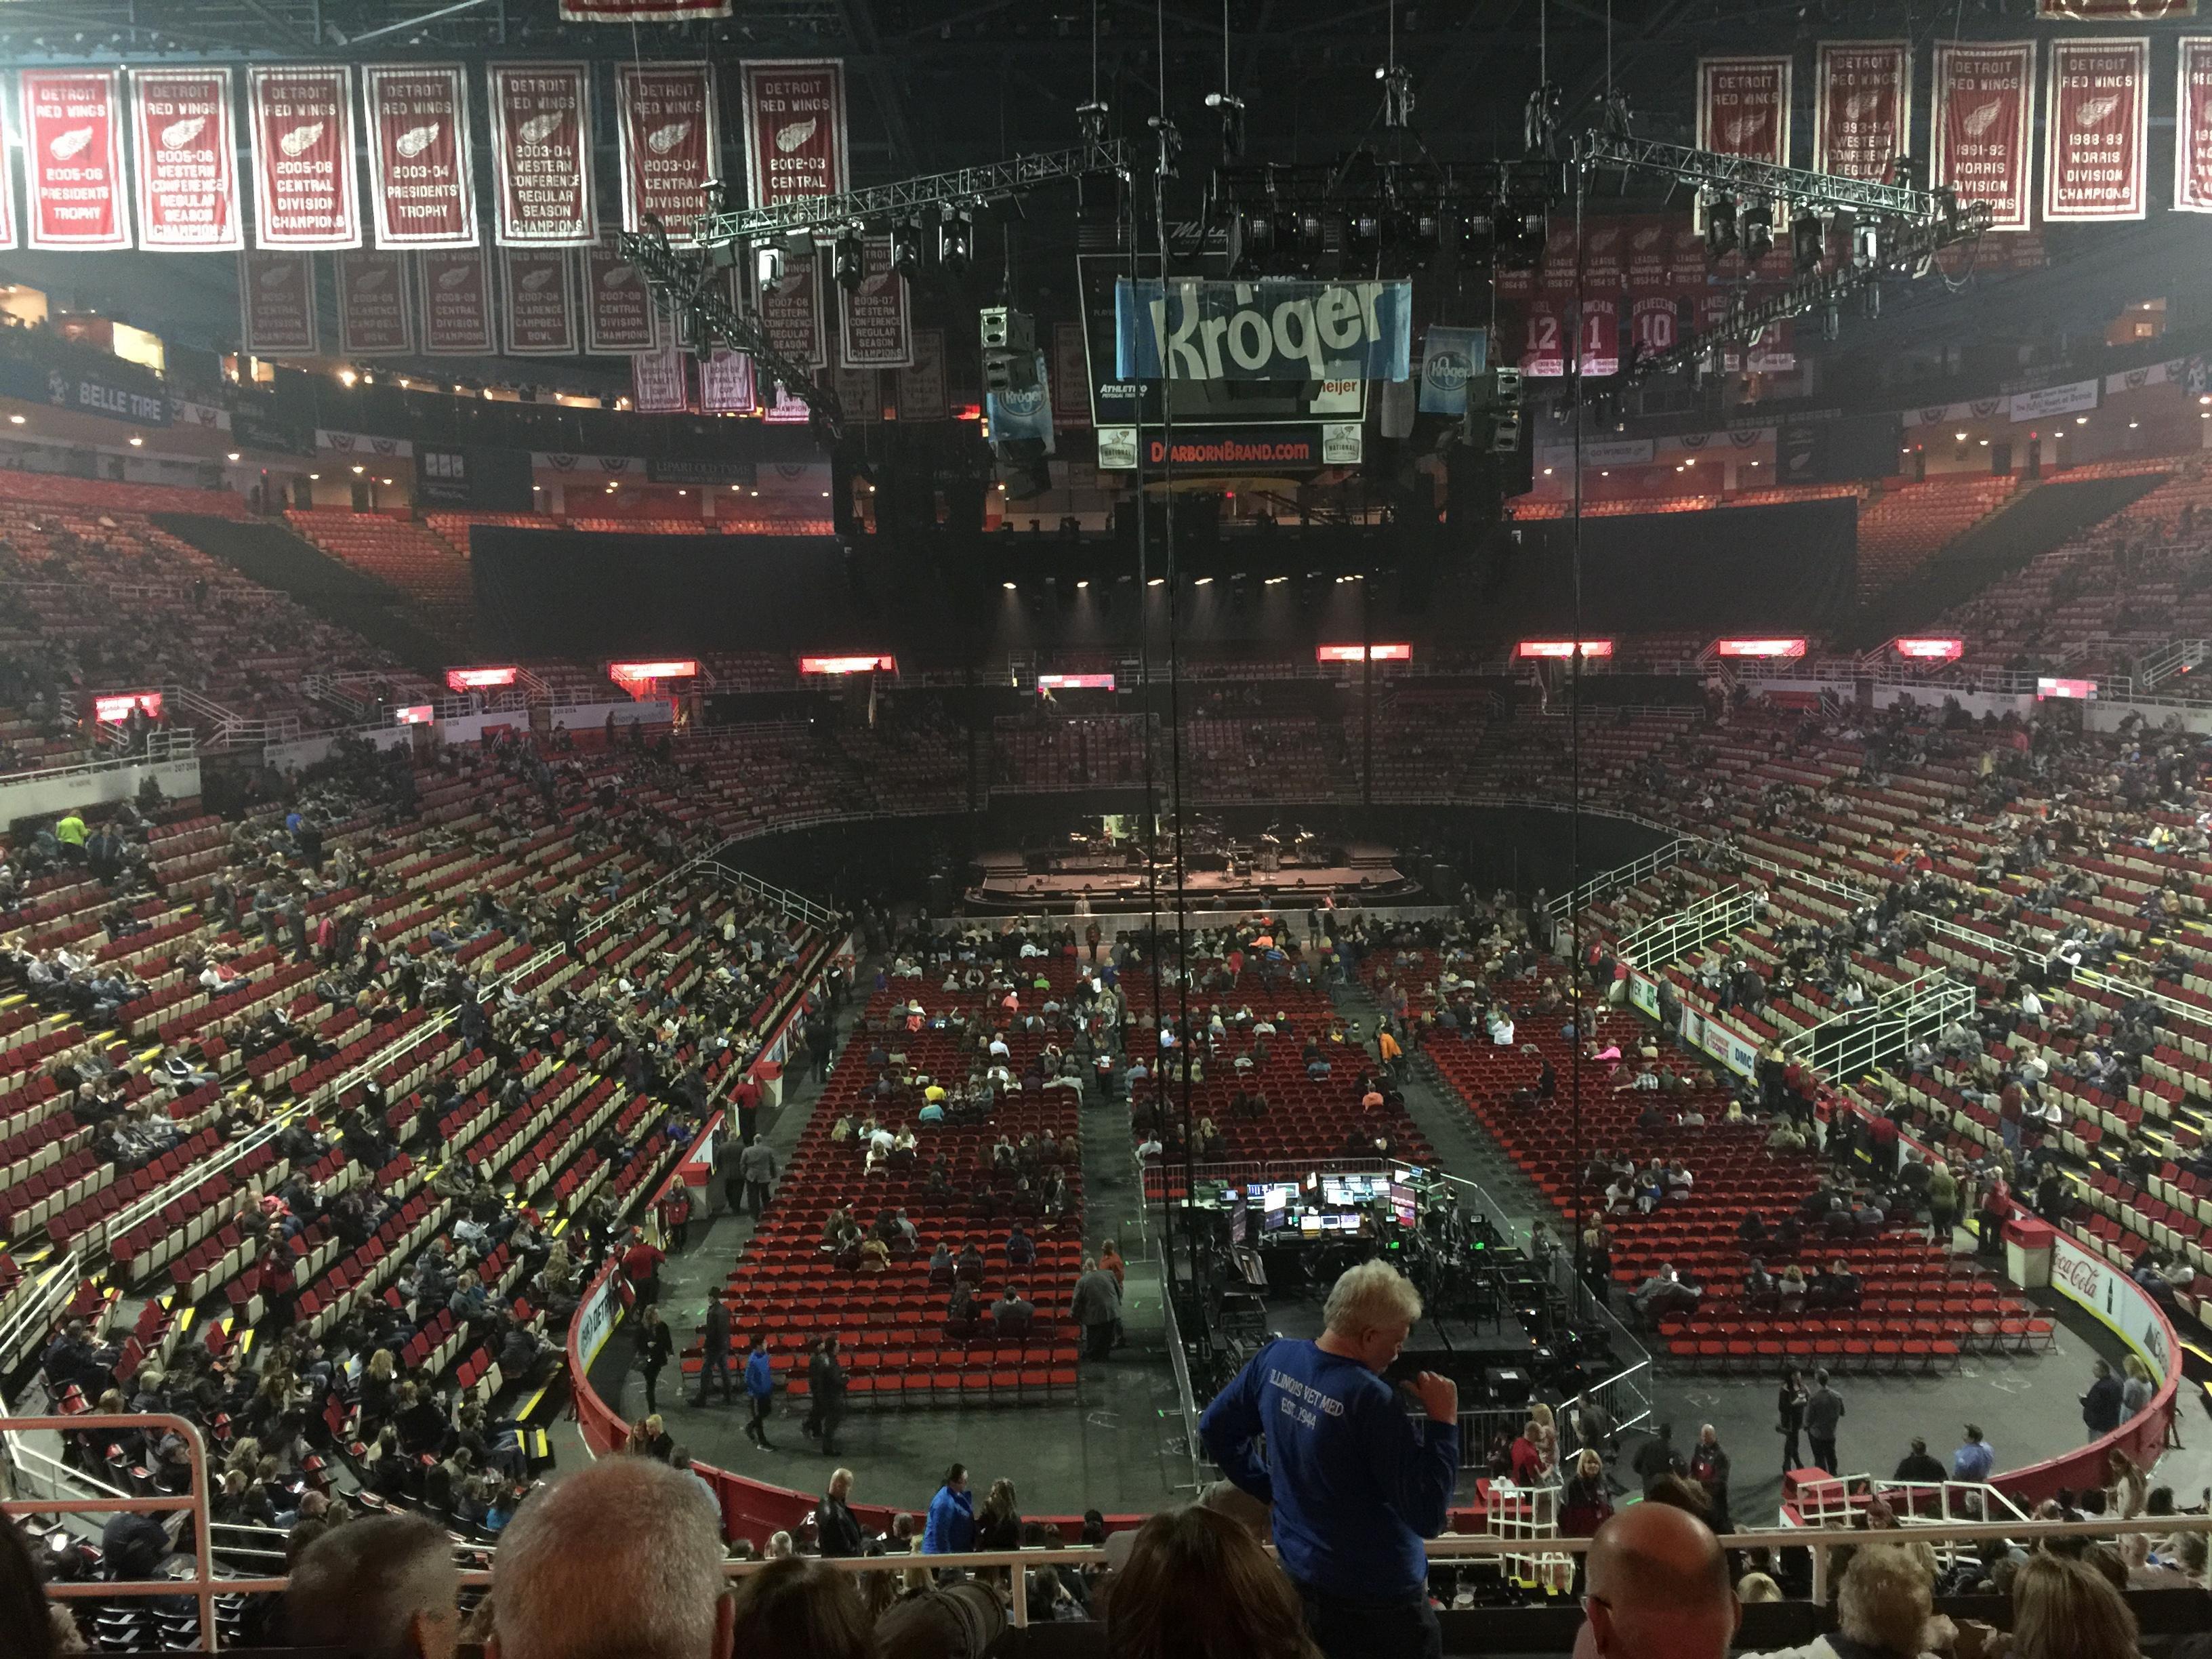 Joe Louis Arena Section 201 Row 8 Seat 8